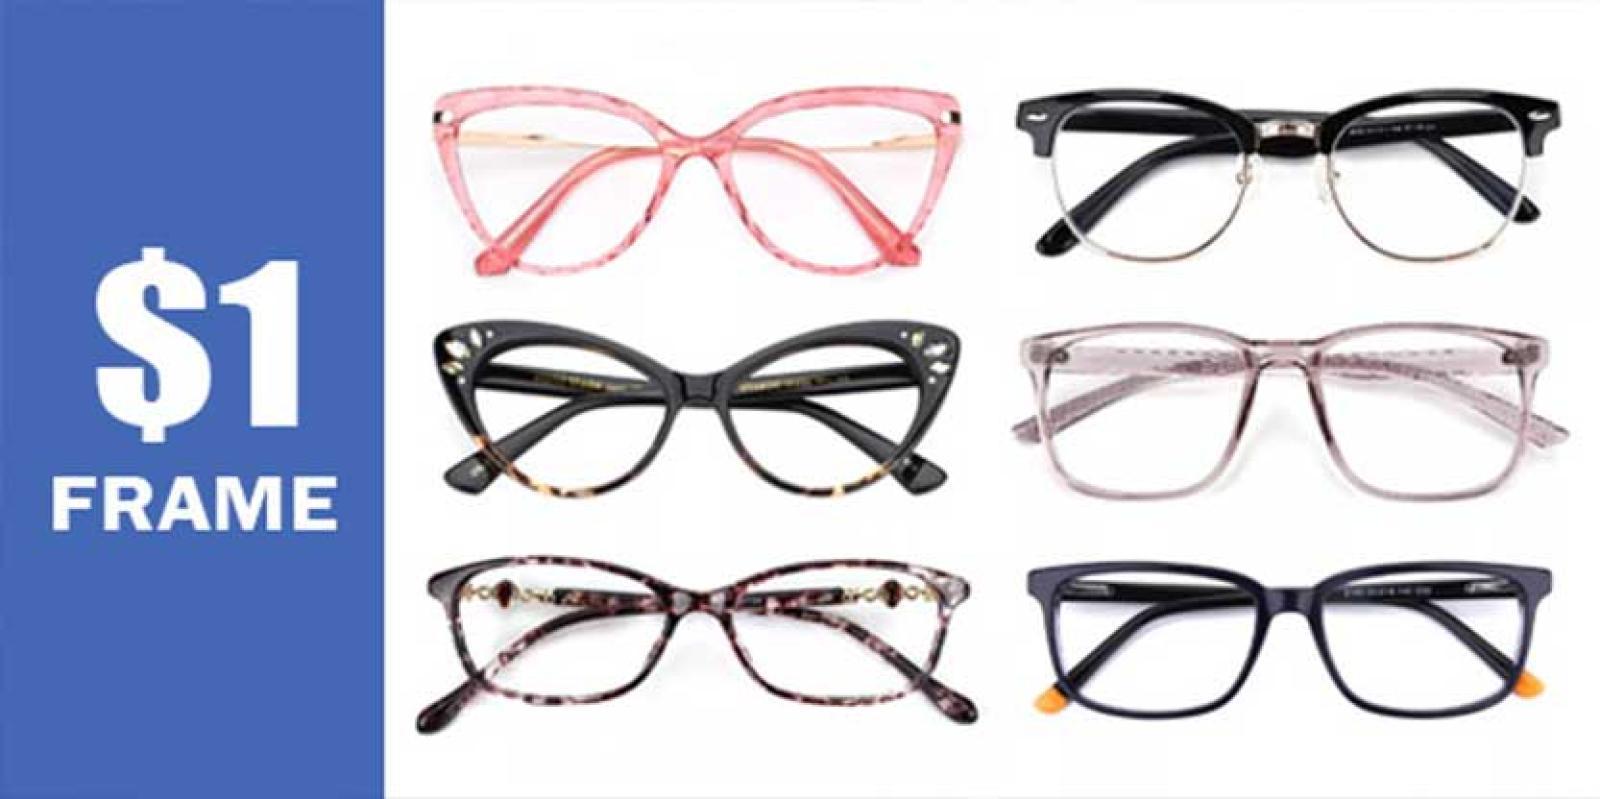 1.57 Standard Index Flat Top Bifocal With Line-Translucent---Eyeglasses-additional3